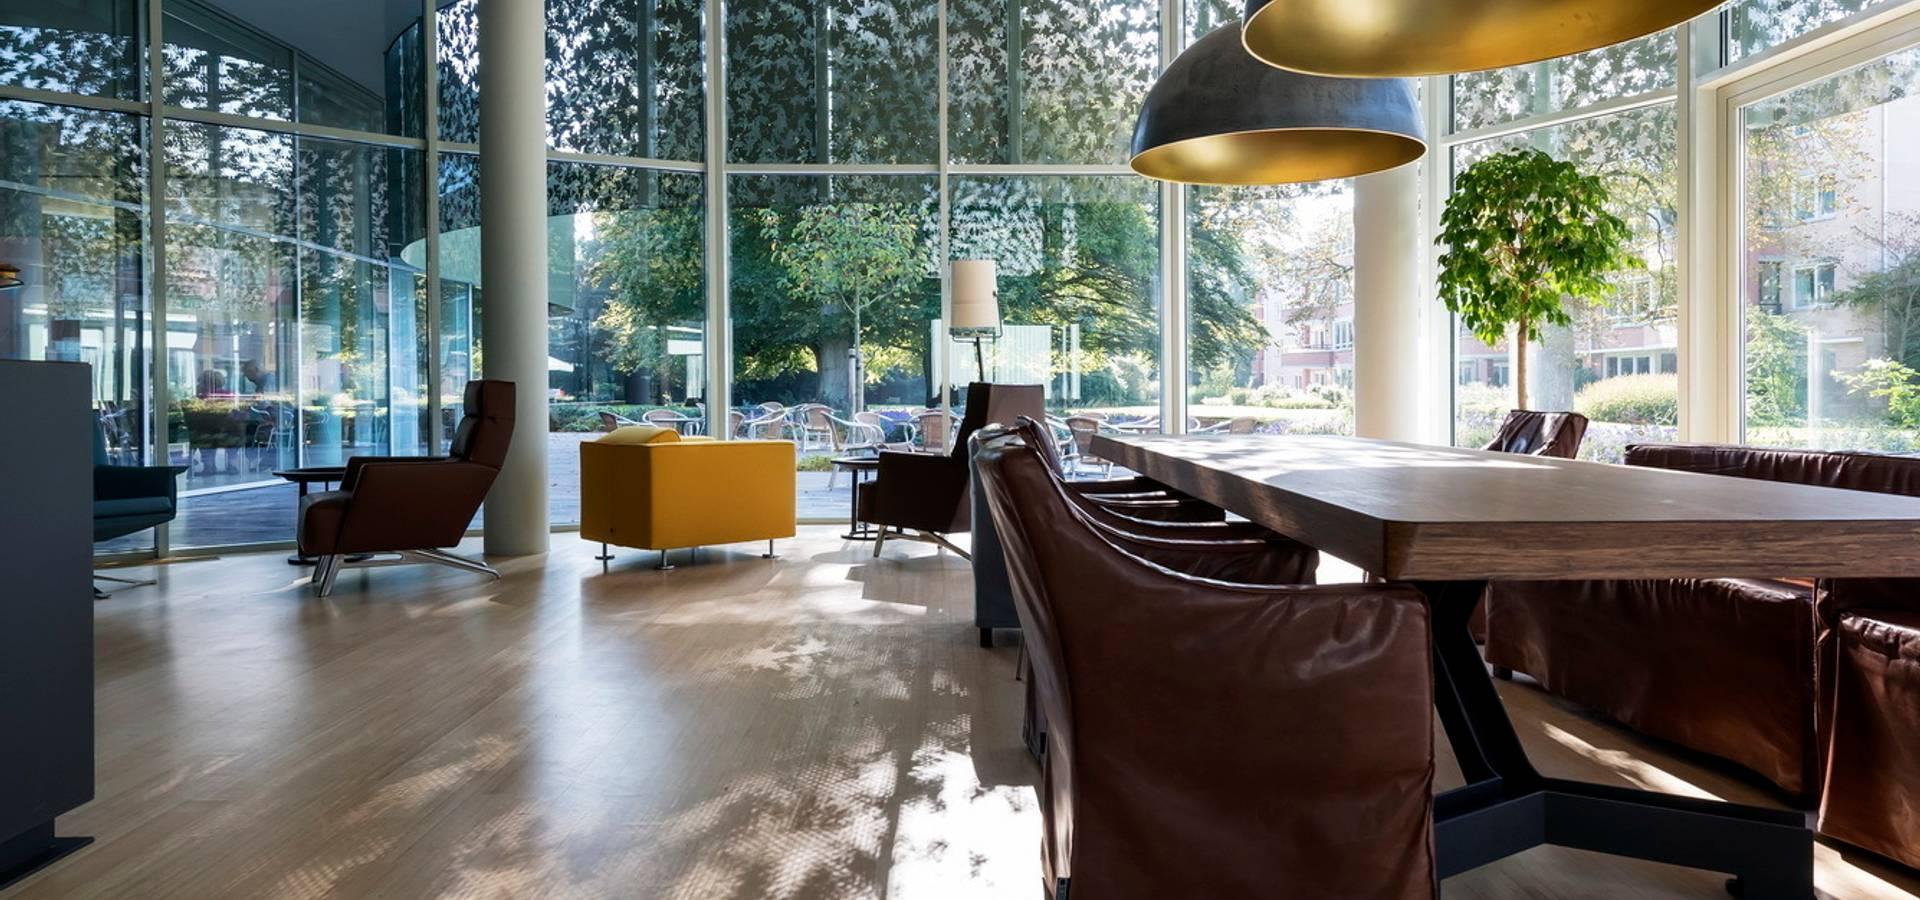 Huis sonnevanck arnhem di tenbraswestinga architectuur interieur en stedenbouw homify - Huis interieur architectuur ...